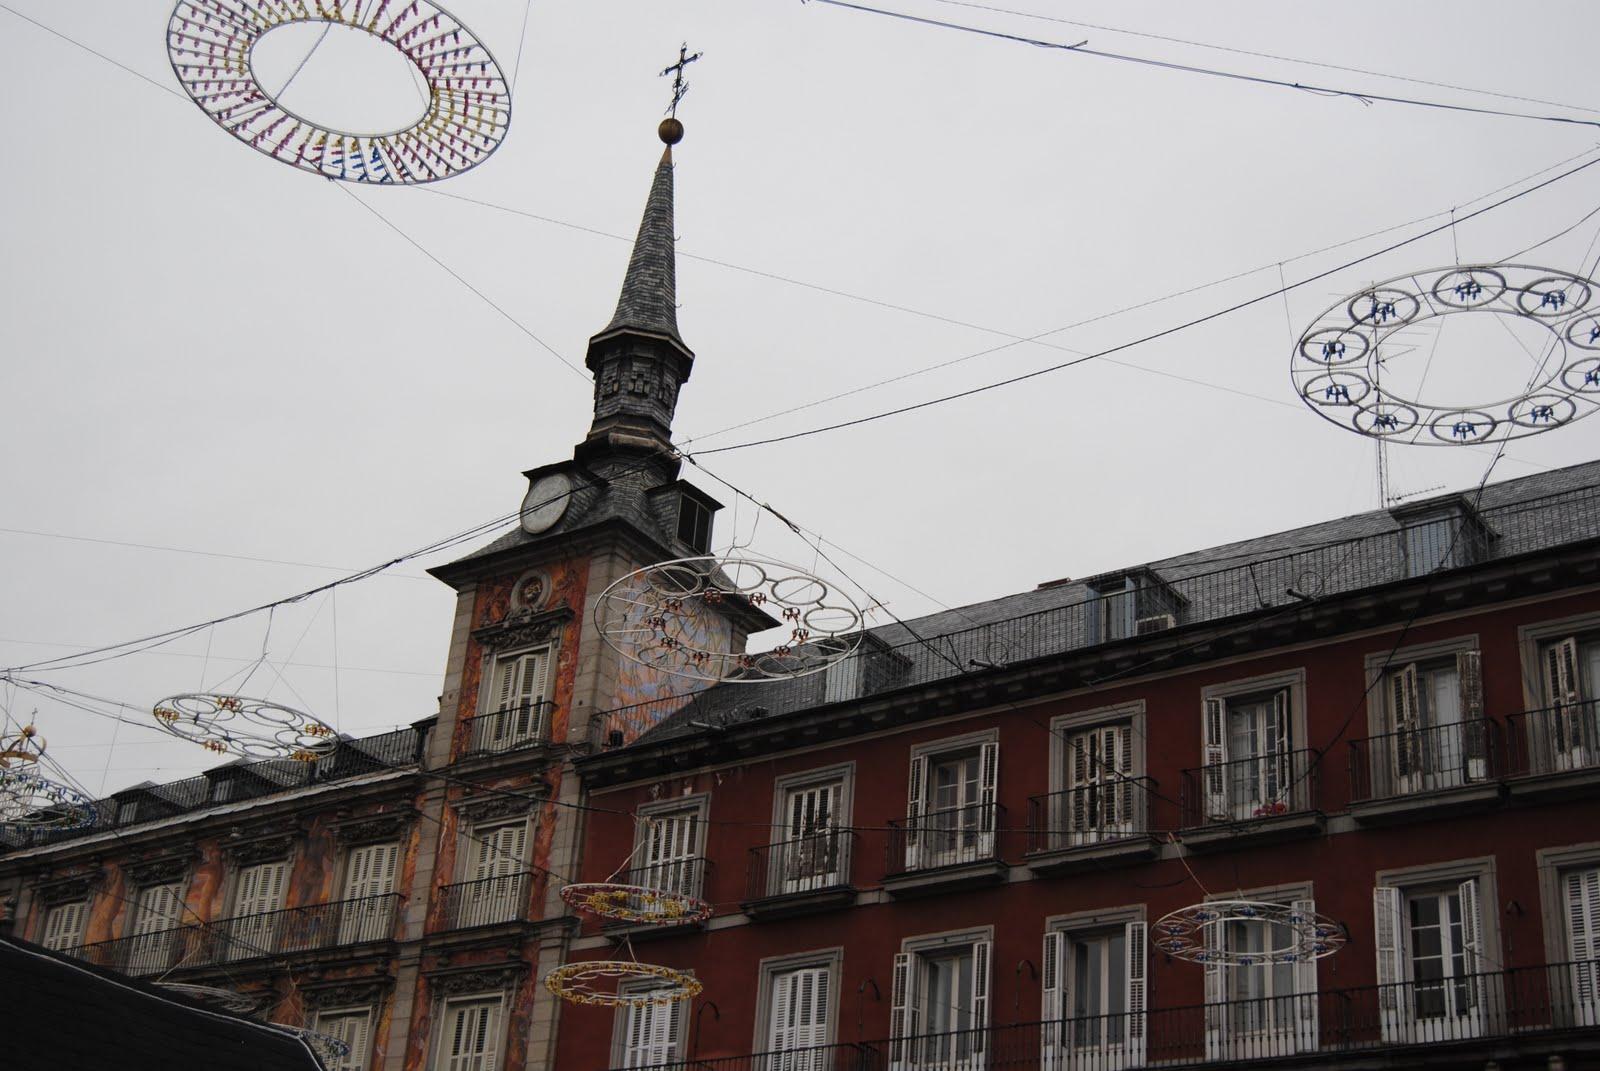 Mi espacio centro hist rico de madrid - Centro historico de madrid ...